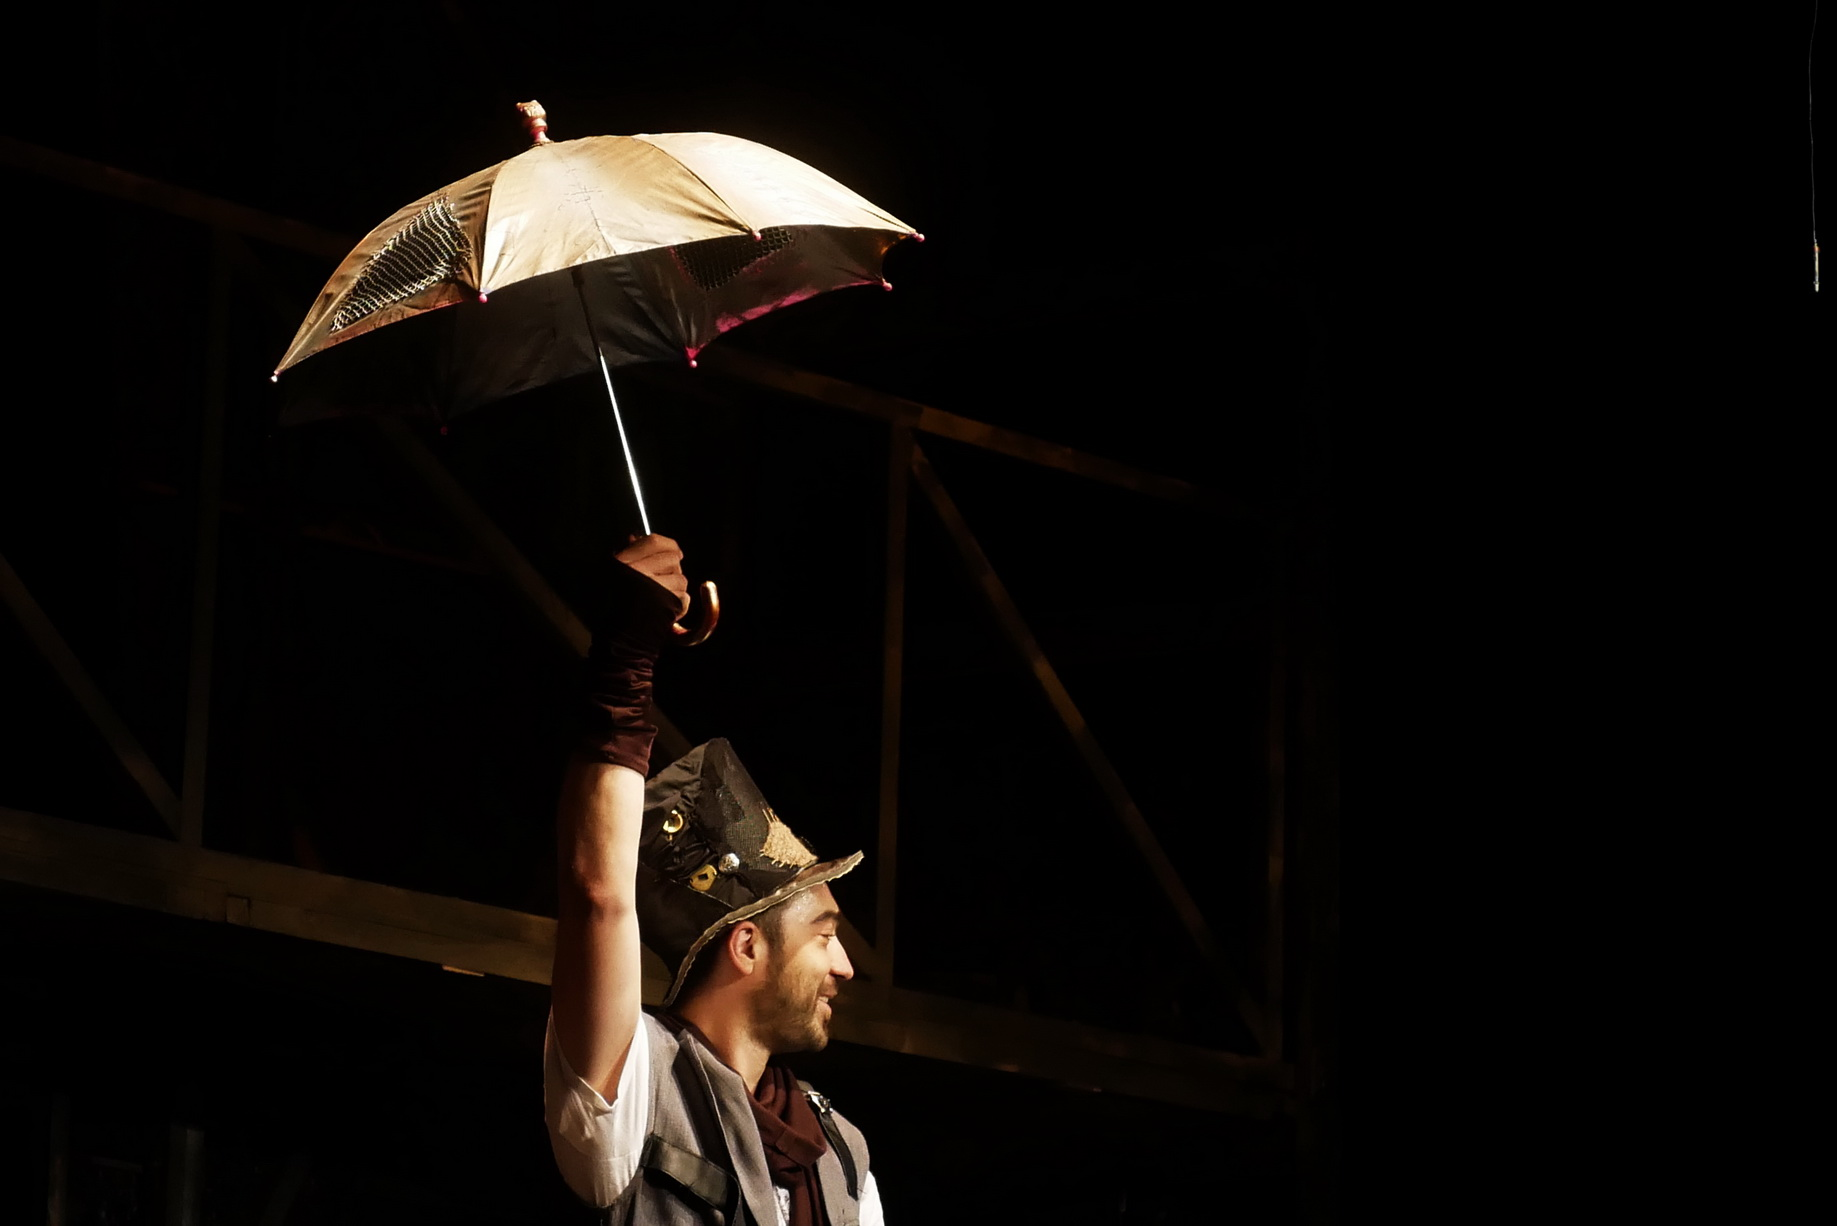 Франківський драмтеатр представив останню прем'єру сезону ''Продавець дощу'' 8